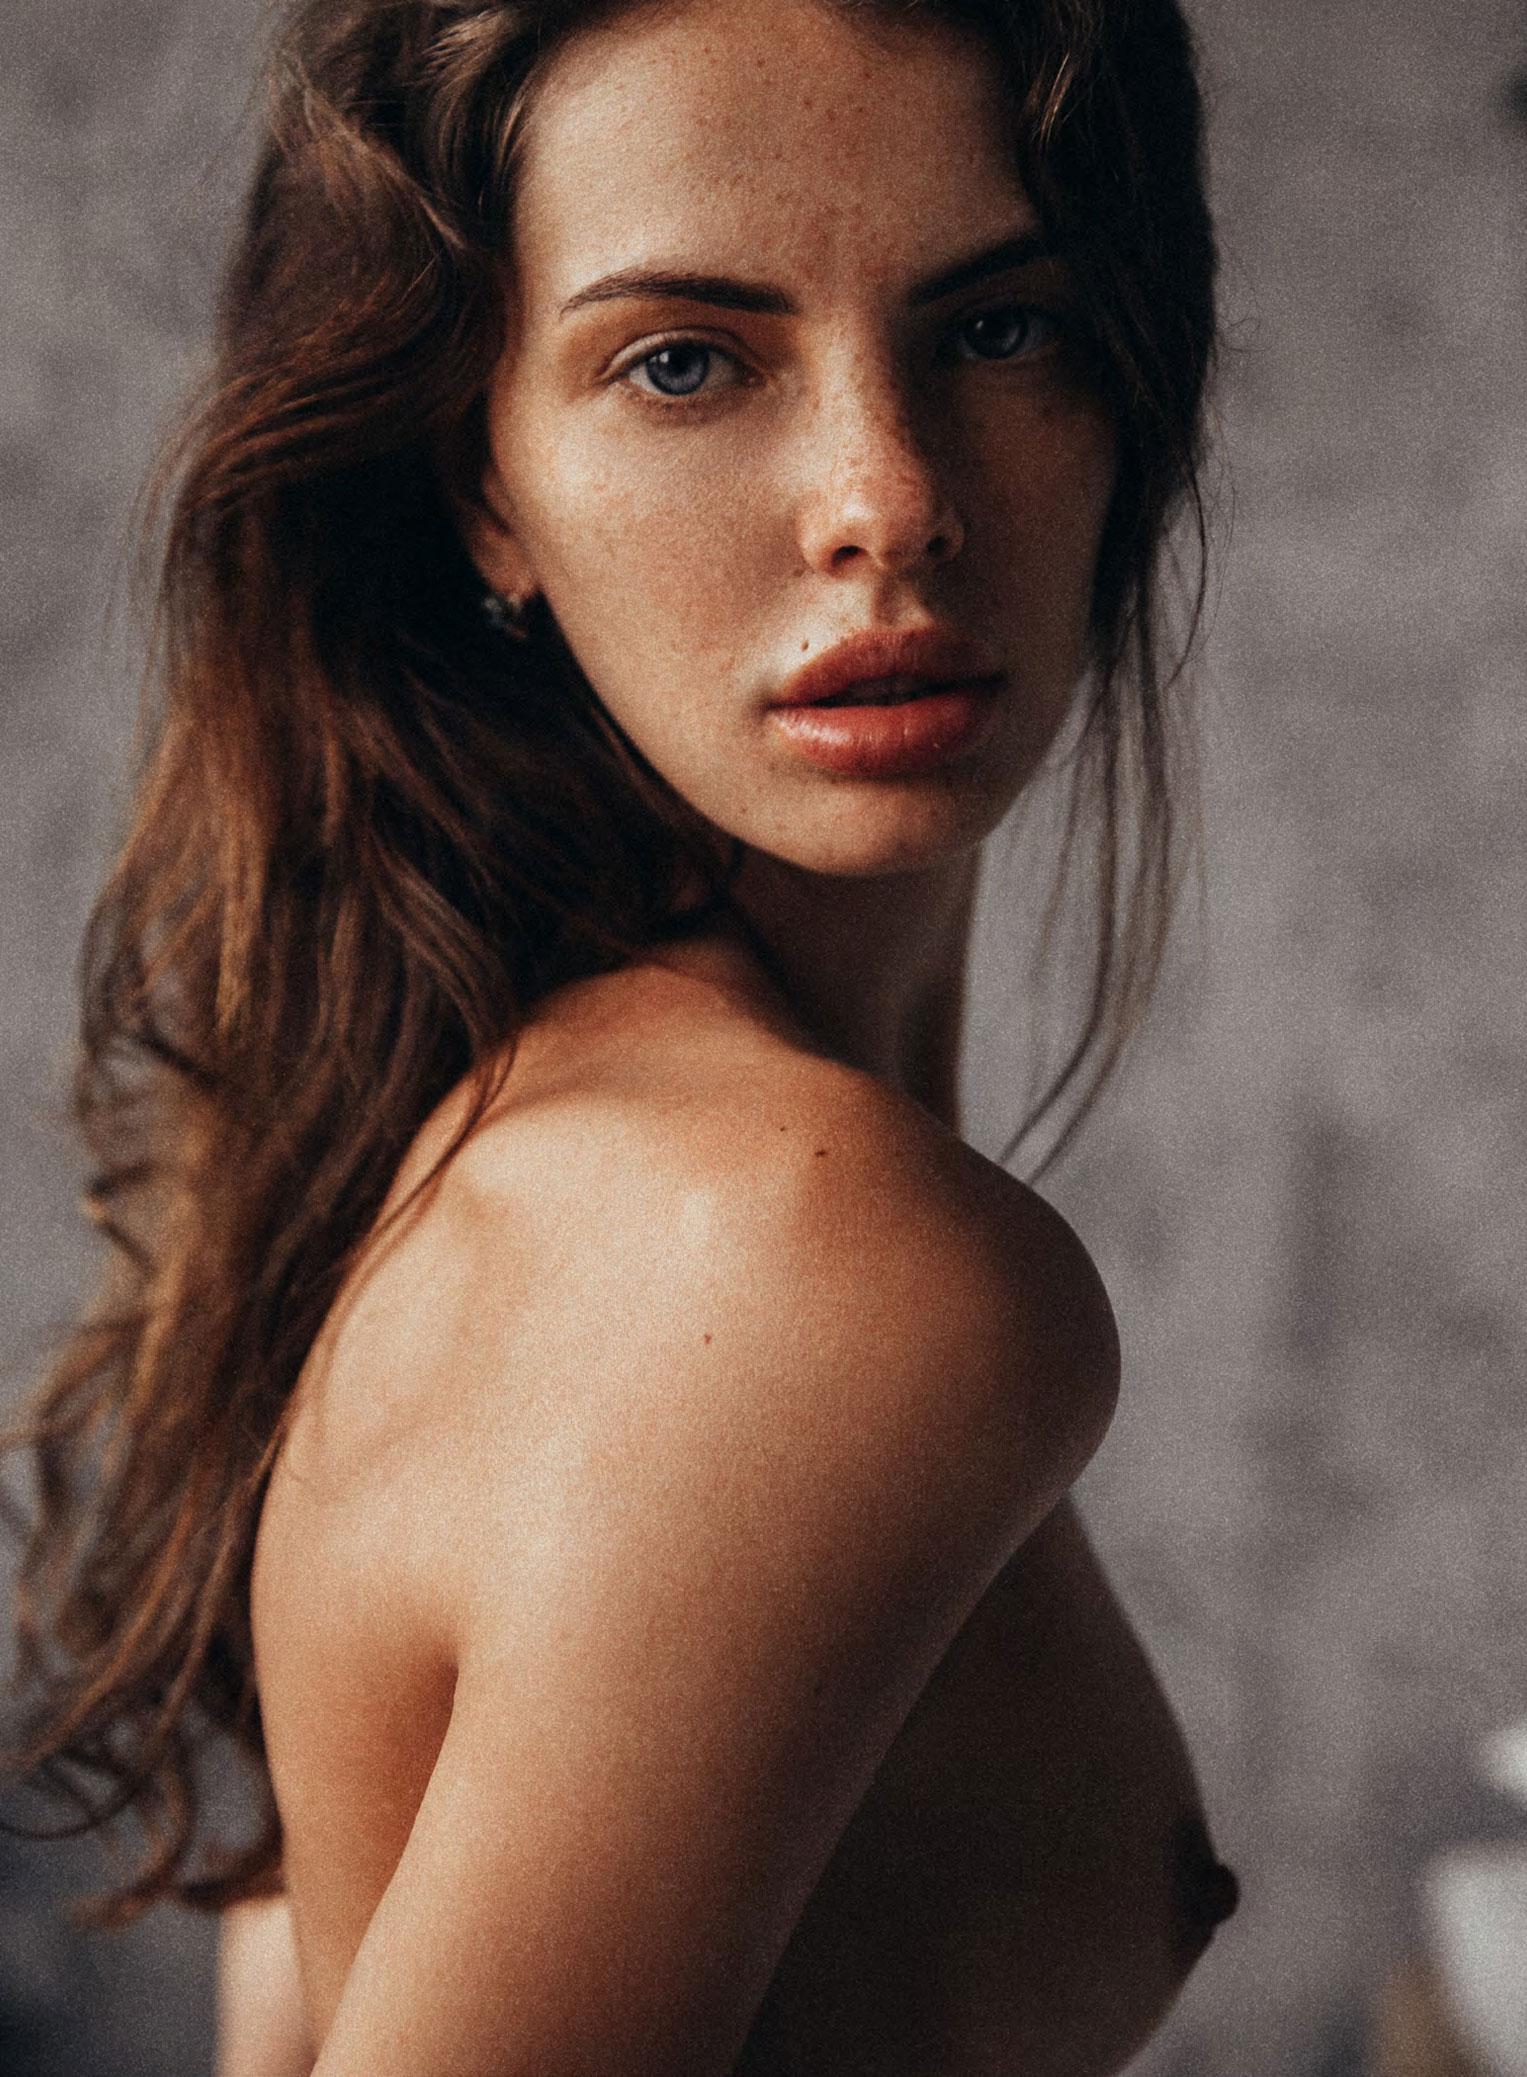 Anna Alexsashina nude by Alexey Trifonov - Insomnia Magazine no.6